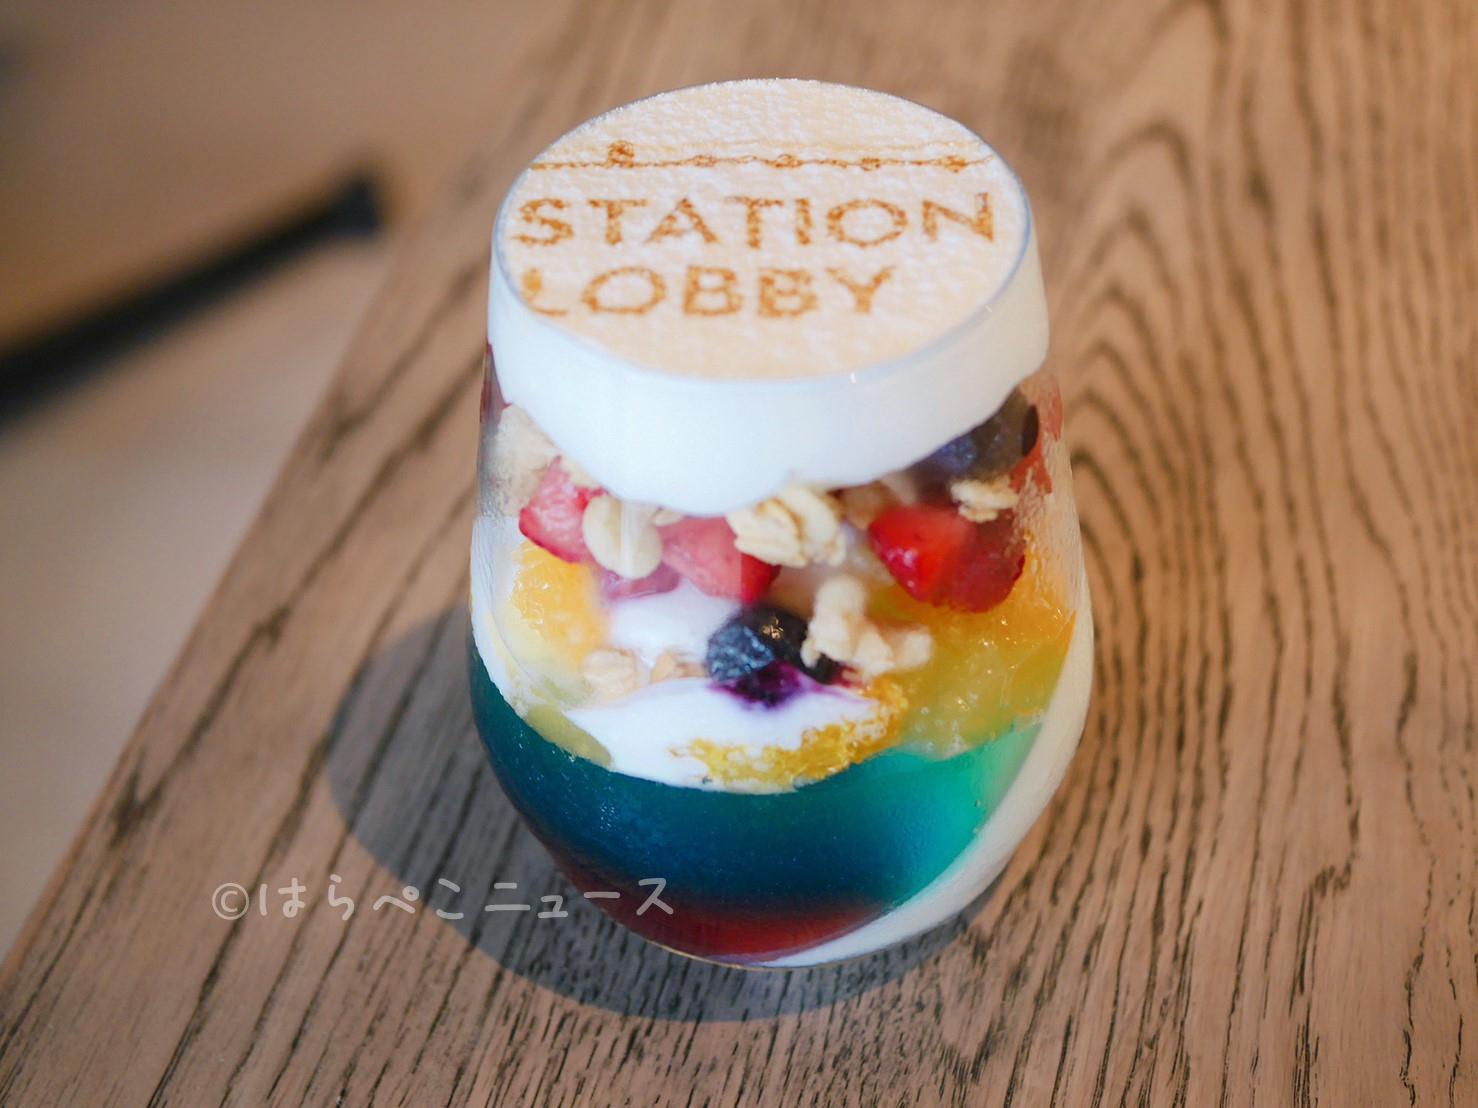 PLAYatreTSUCHIURA STATION LOBBY プレイアトレ ステーションロビー 土浦 ナナイロパフェ